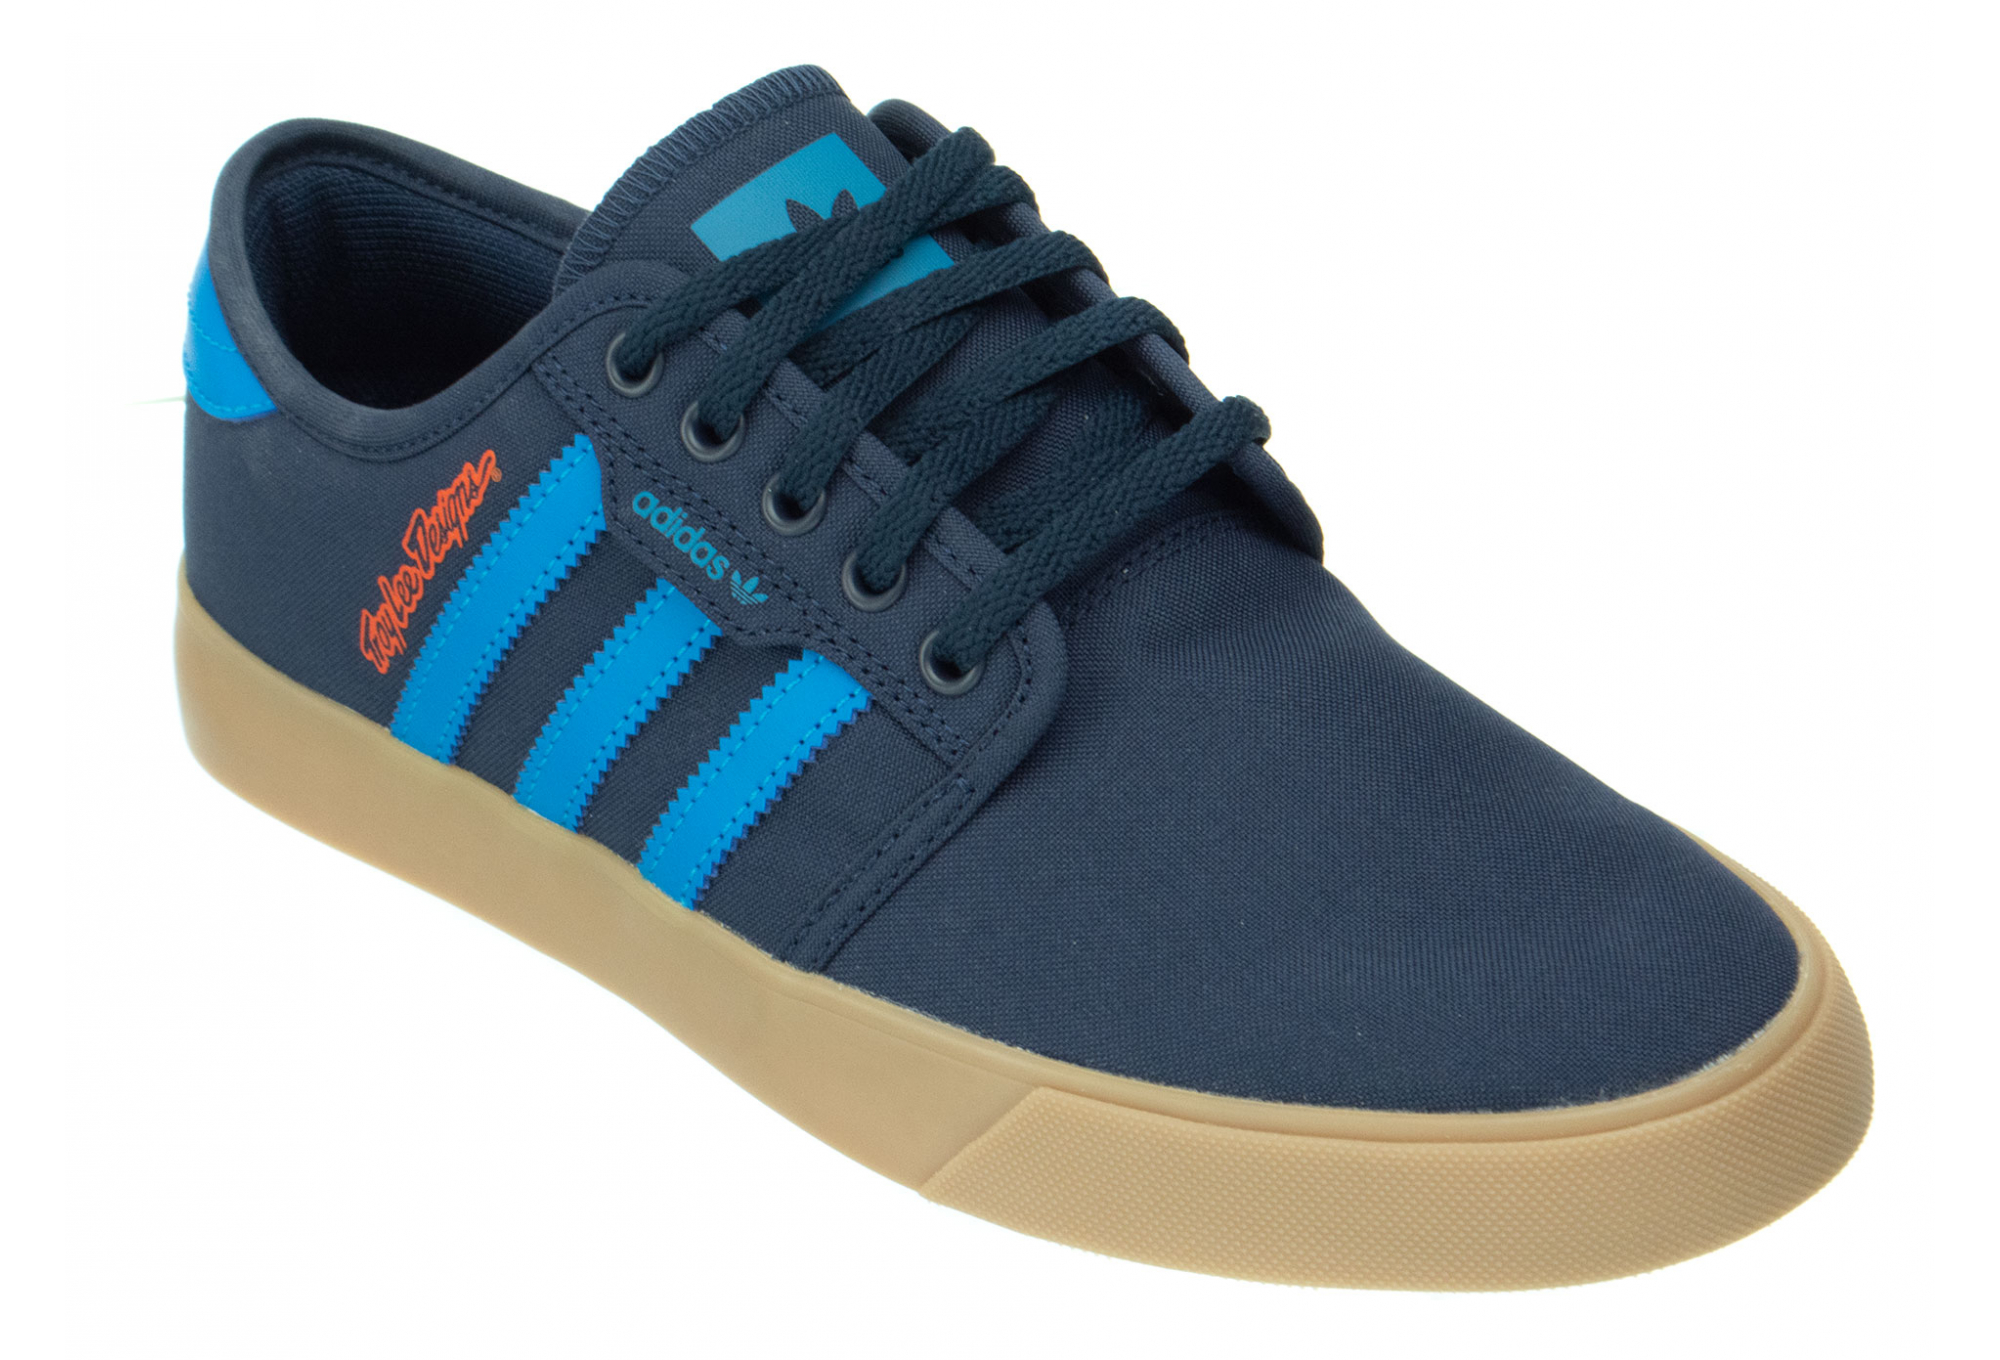 Troy Lee Designs Seeley LTD Adidas Team Shoes Navy Blue